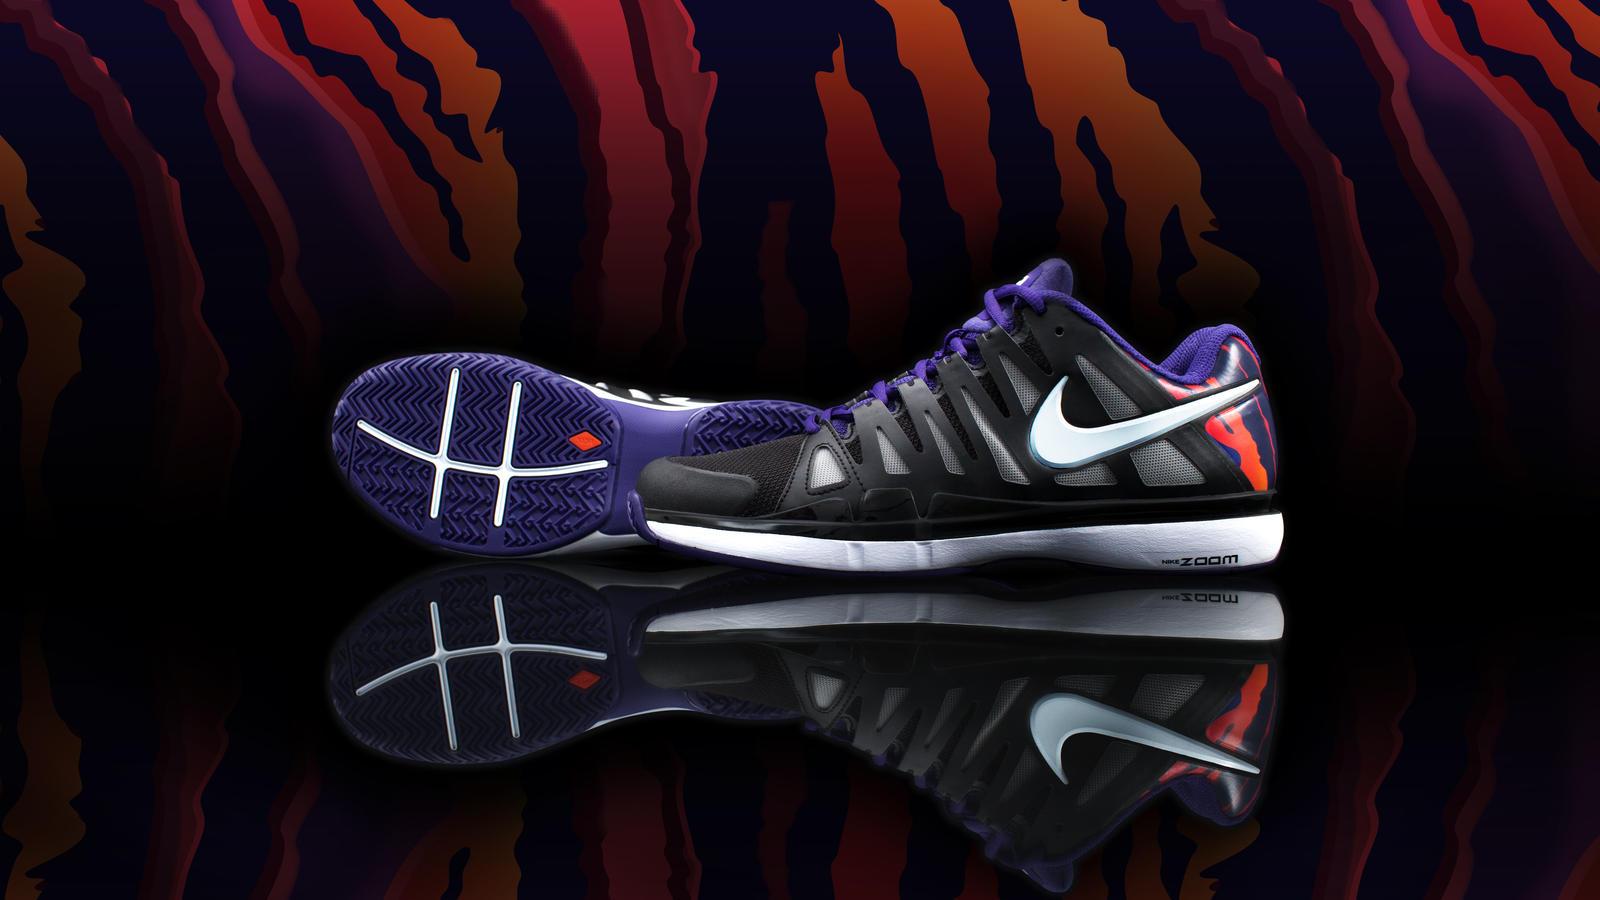 nike vapor zoom tennis shoes nike plus workout